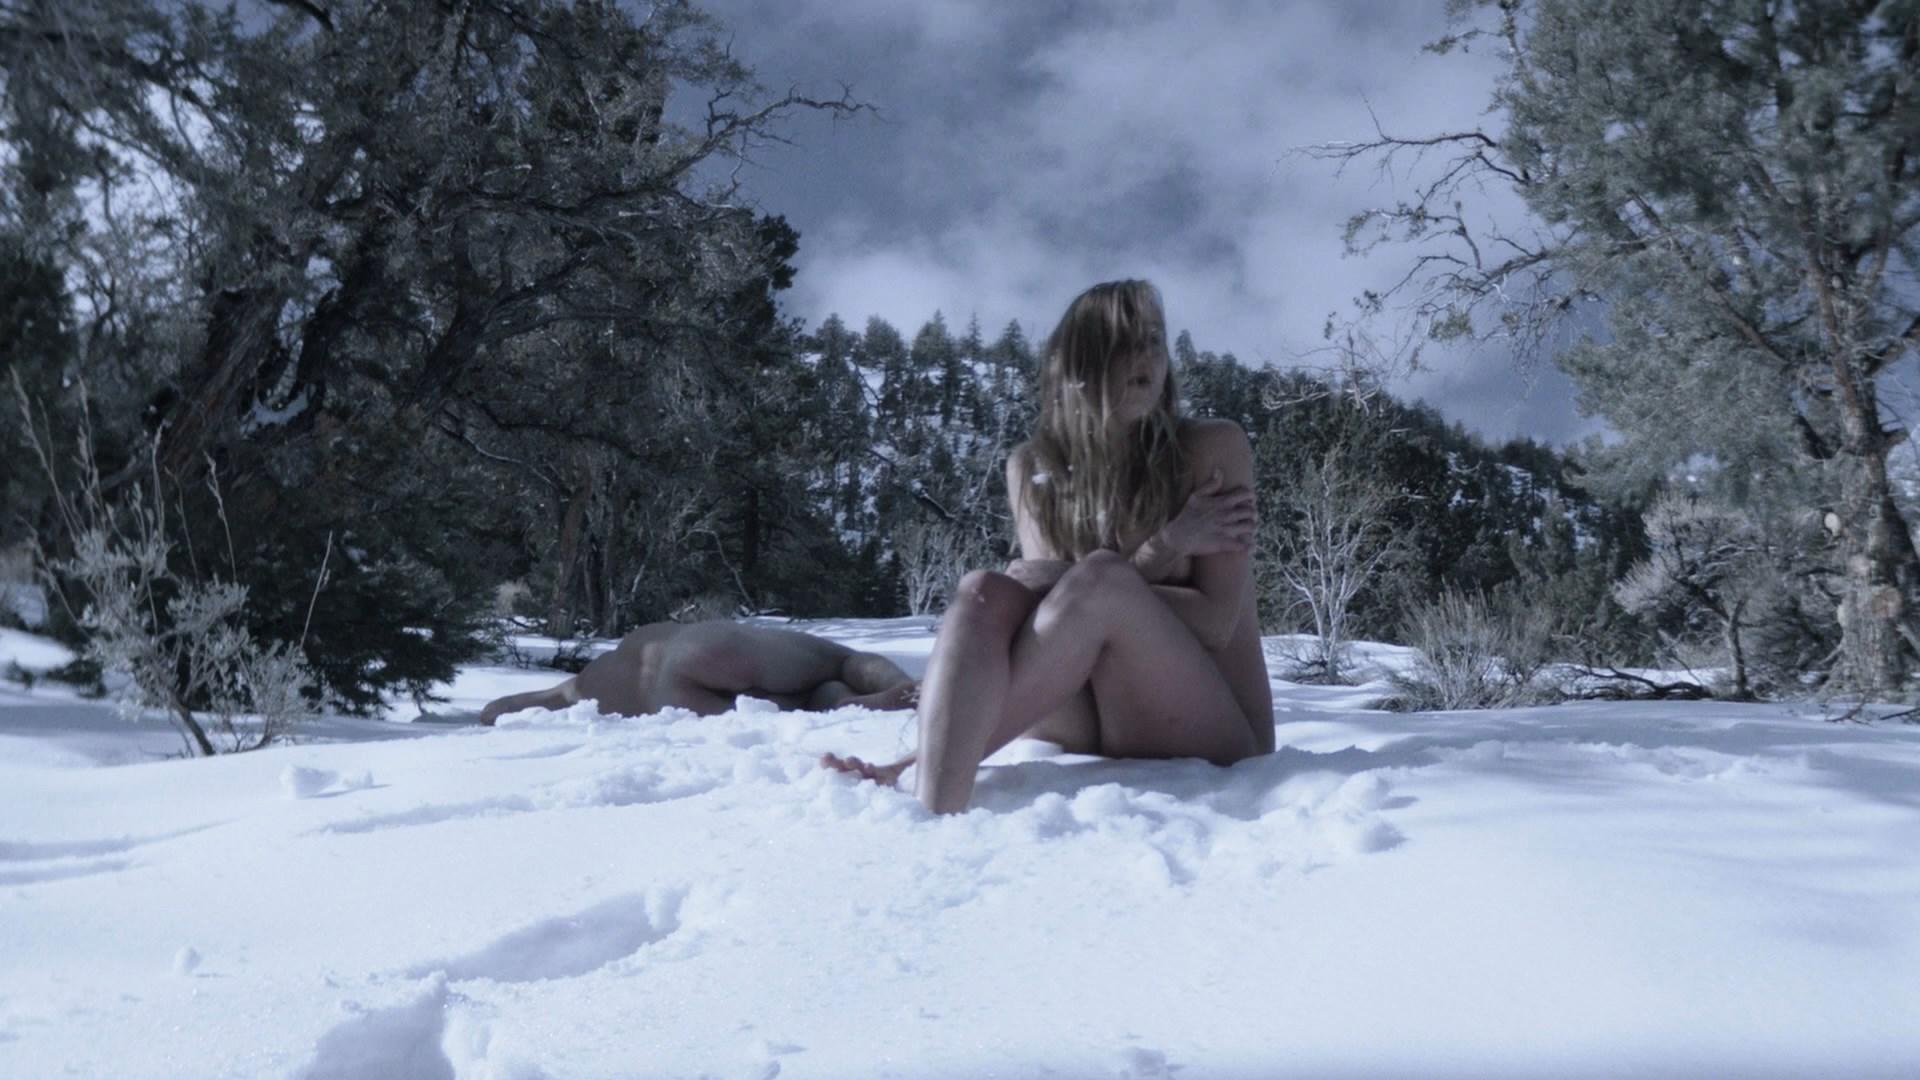 Erotic story snowbound